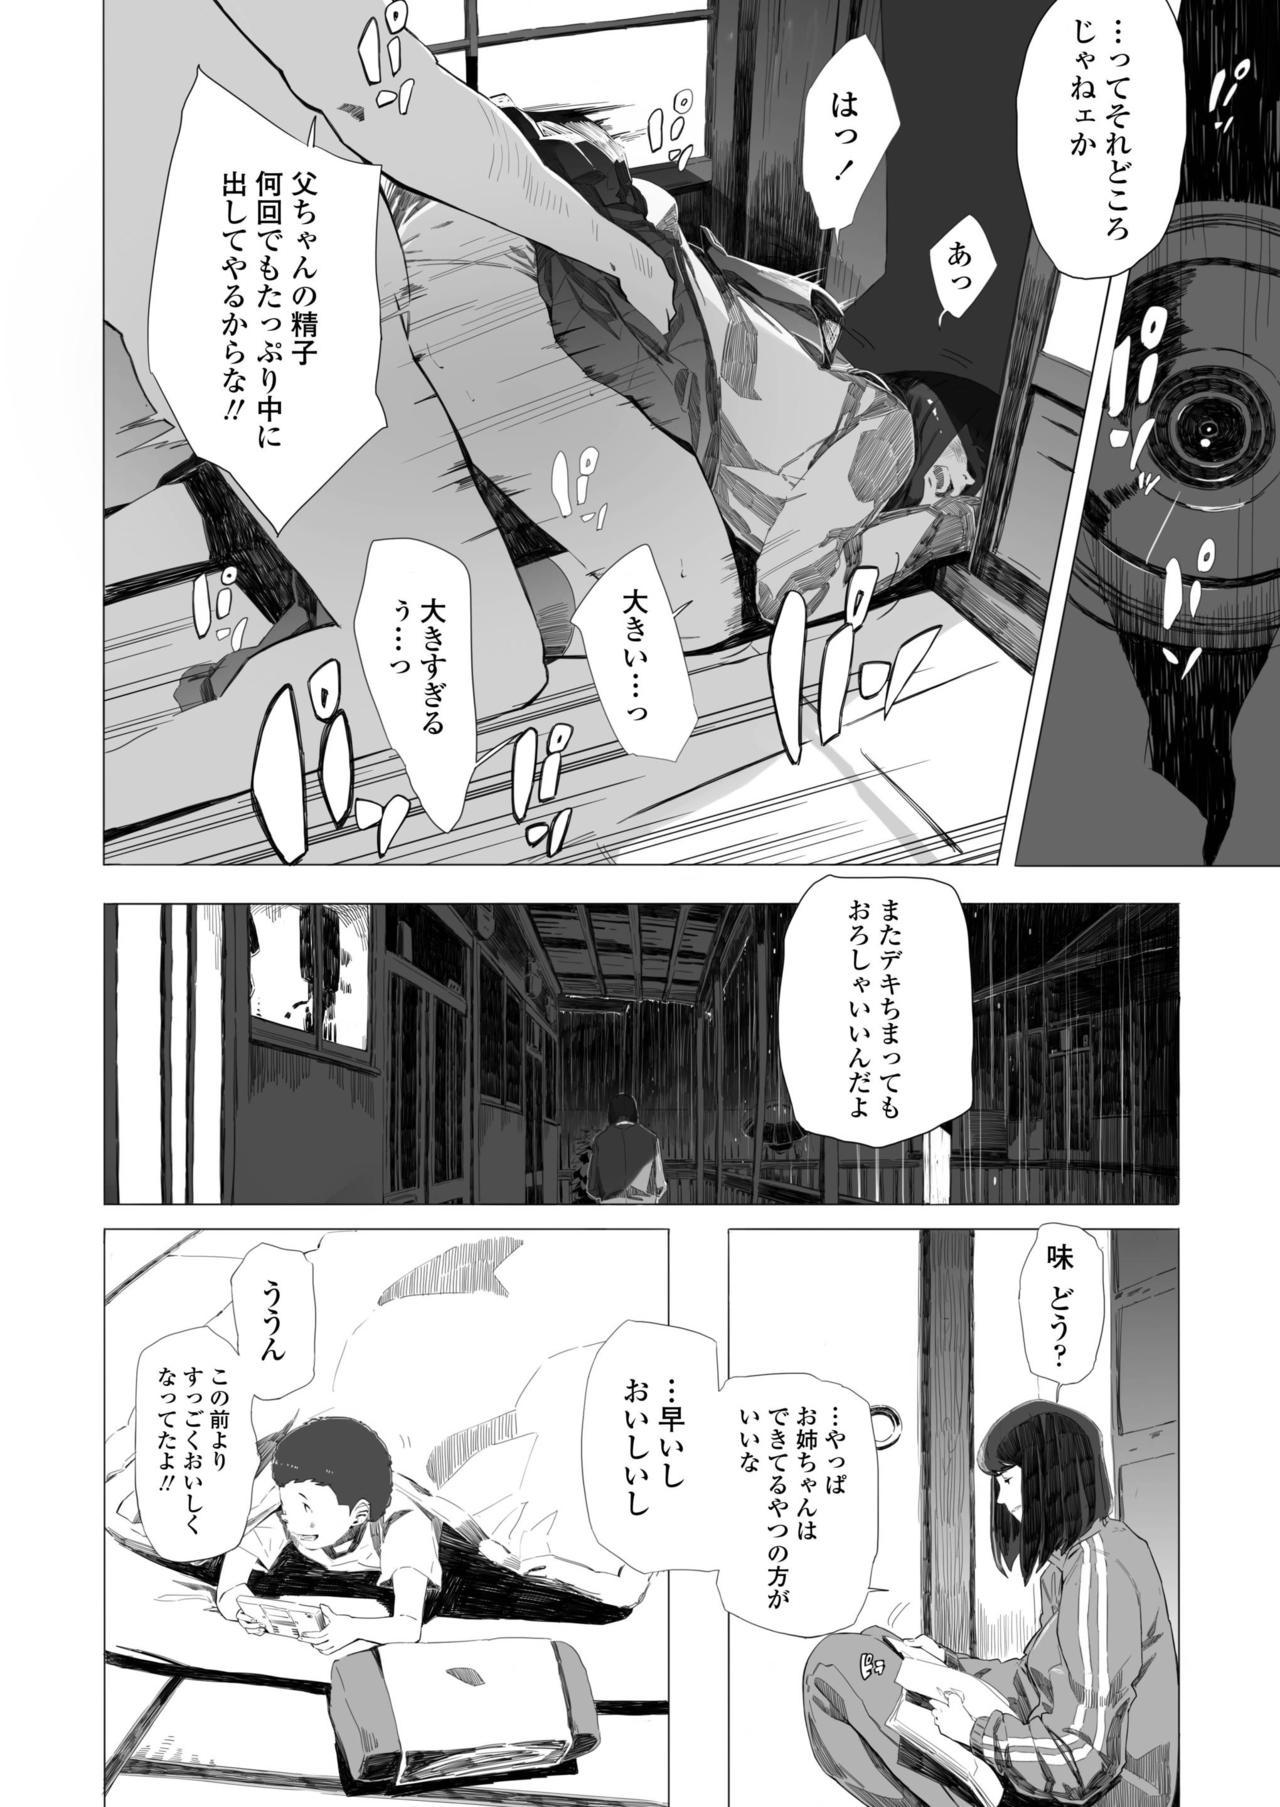 COMIC AOHA 2019 Haru 409